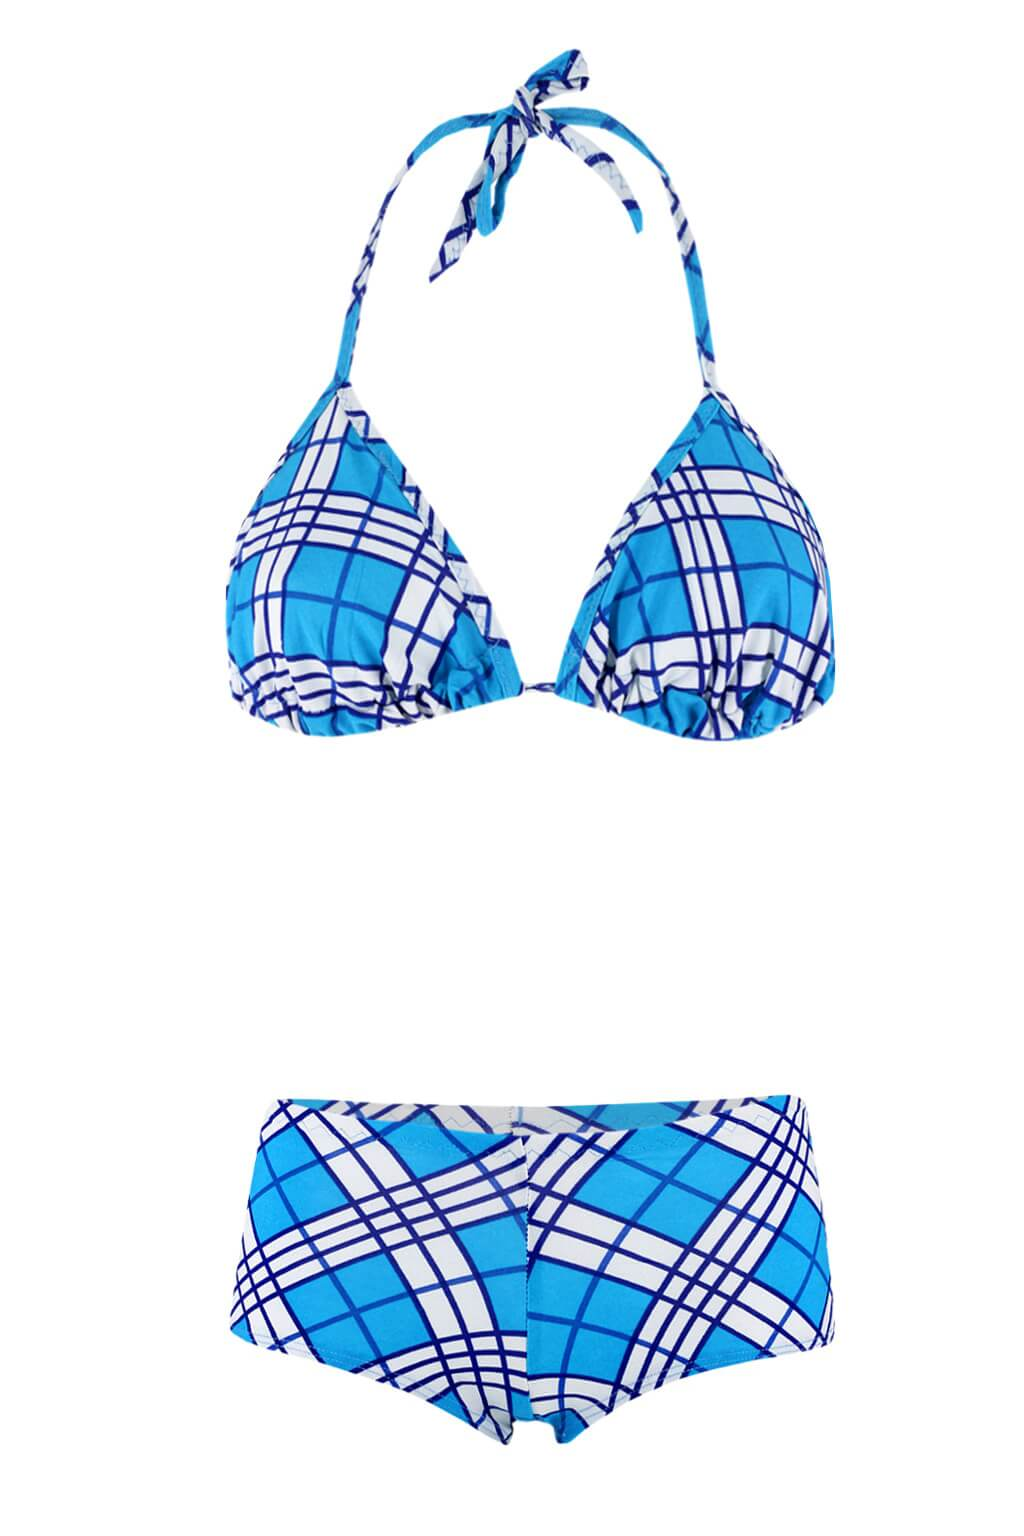 Aqua E plavky se sukénkou M modrá